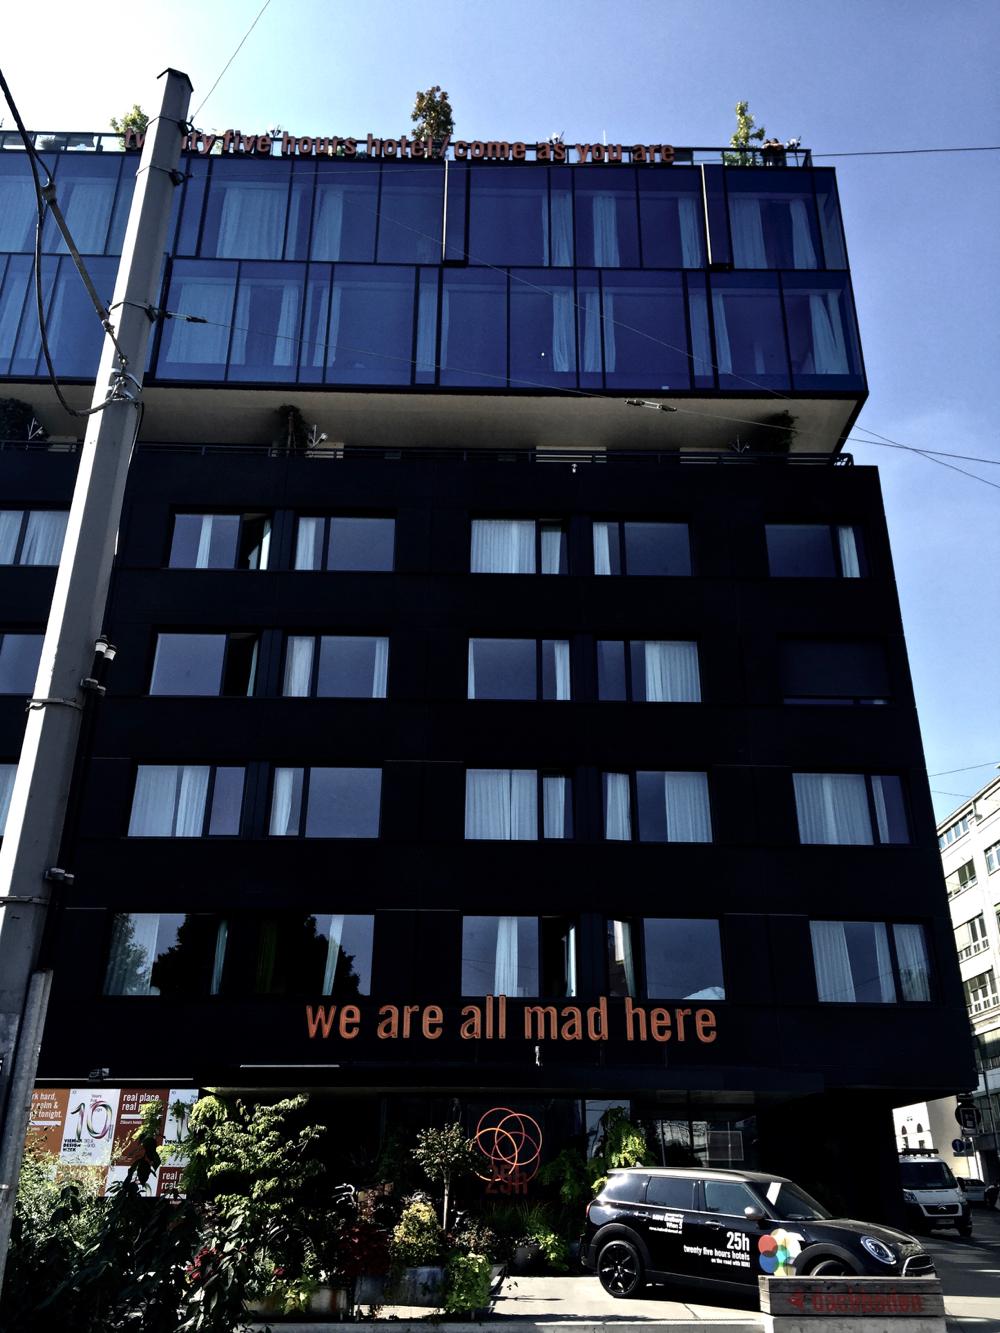 BLOG-MODE-HOMME-VOYAGE-viene-museum-quartier-mq-leopold-museum-schiele-egon-25h-hours-hotel